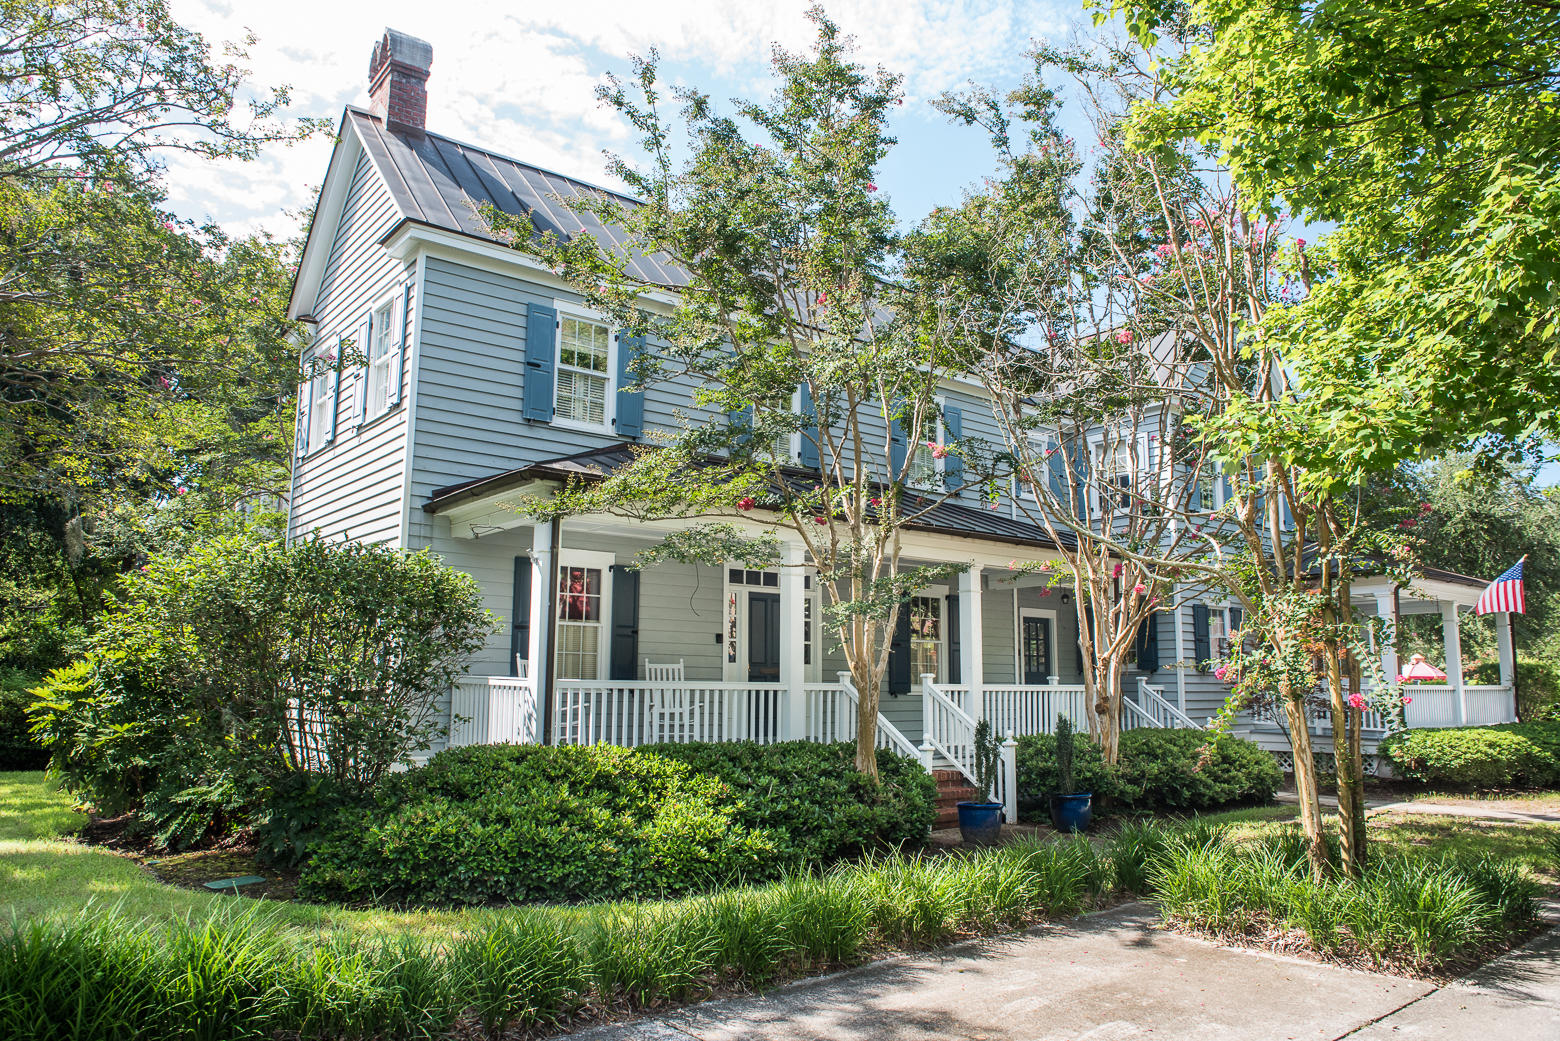 Old Village Homes For Sale - 747 Pitt, Mount Pleasant, SC - 48